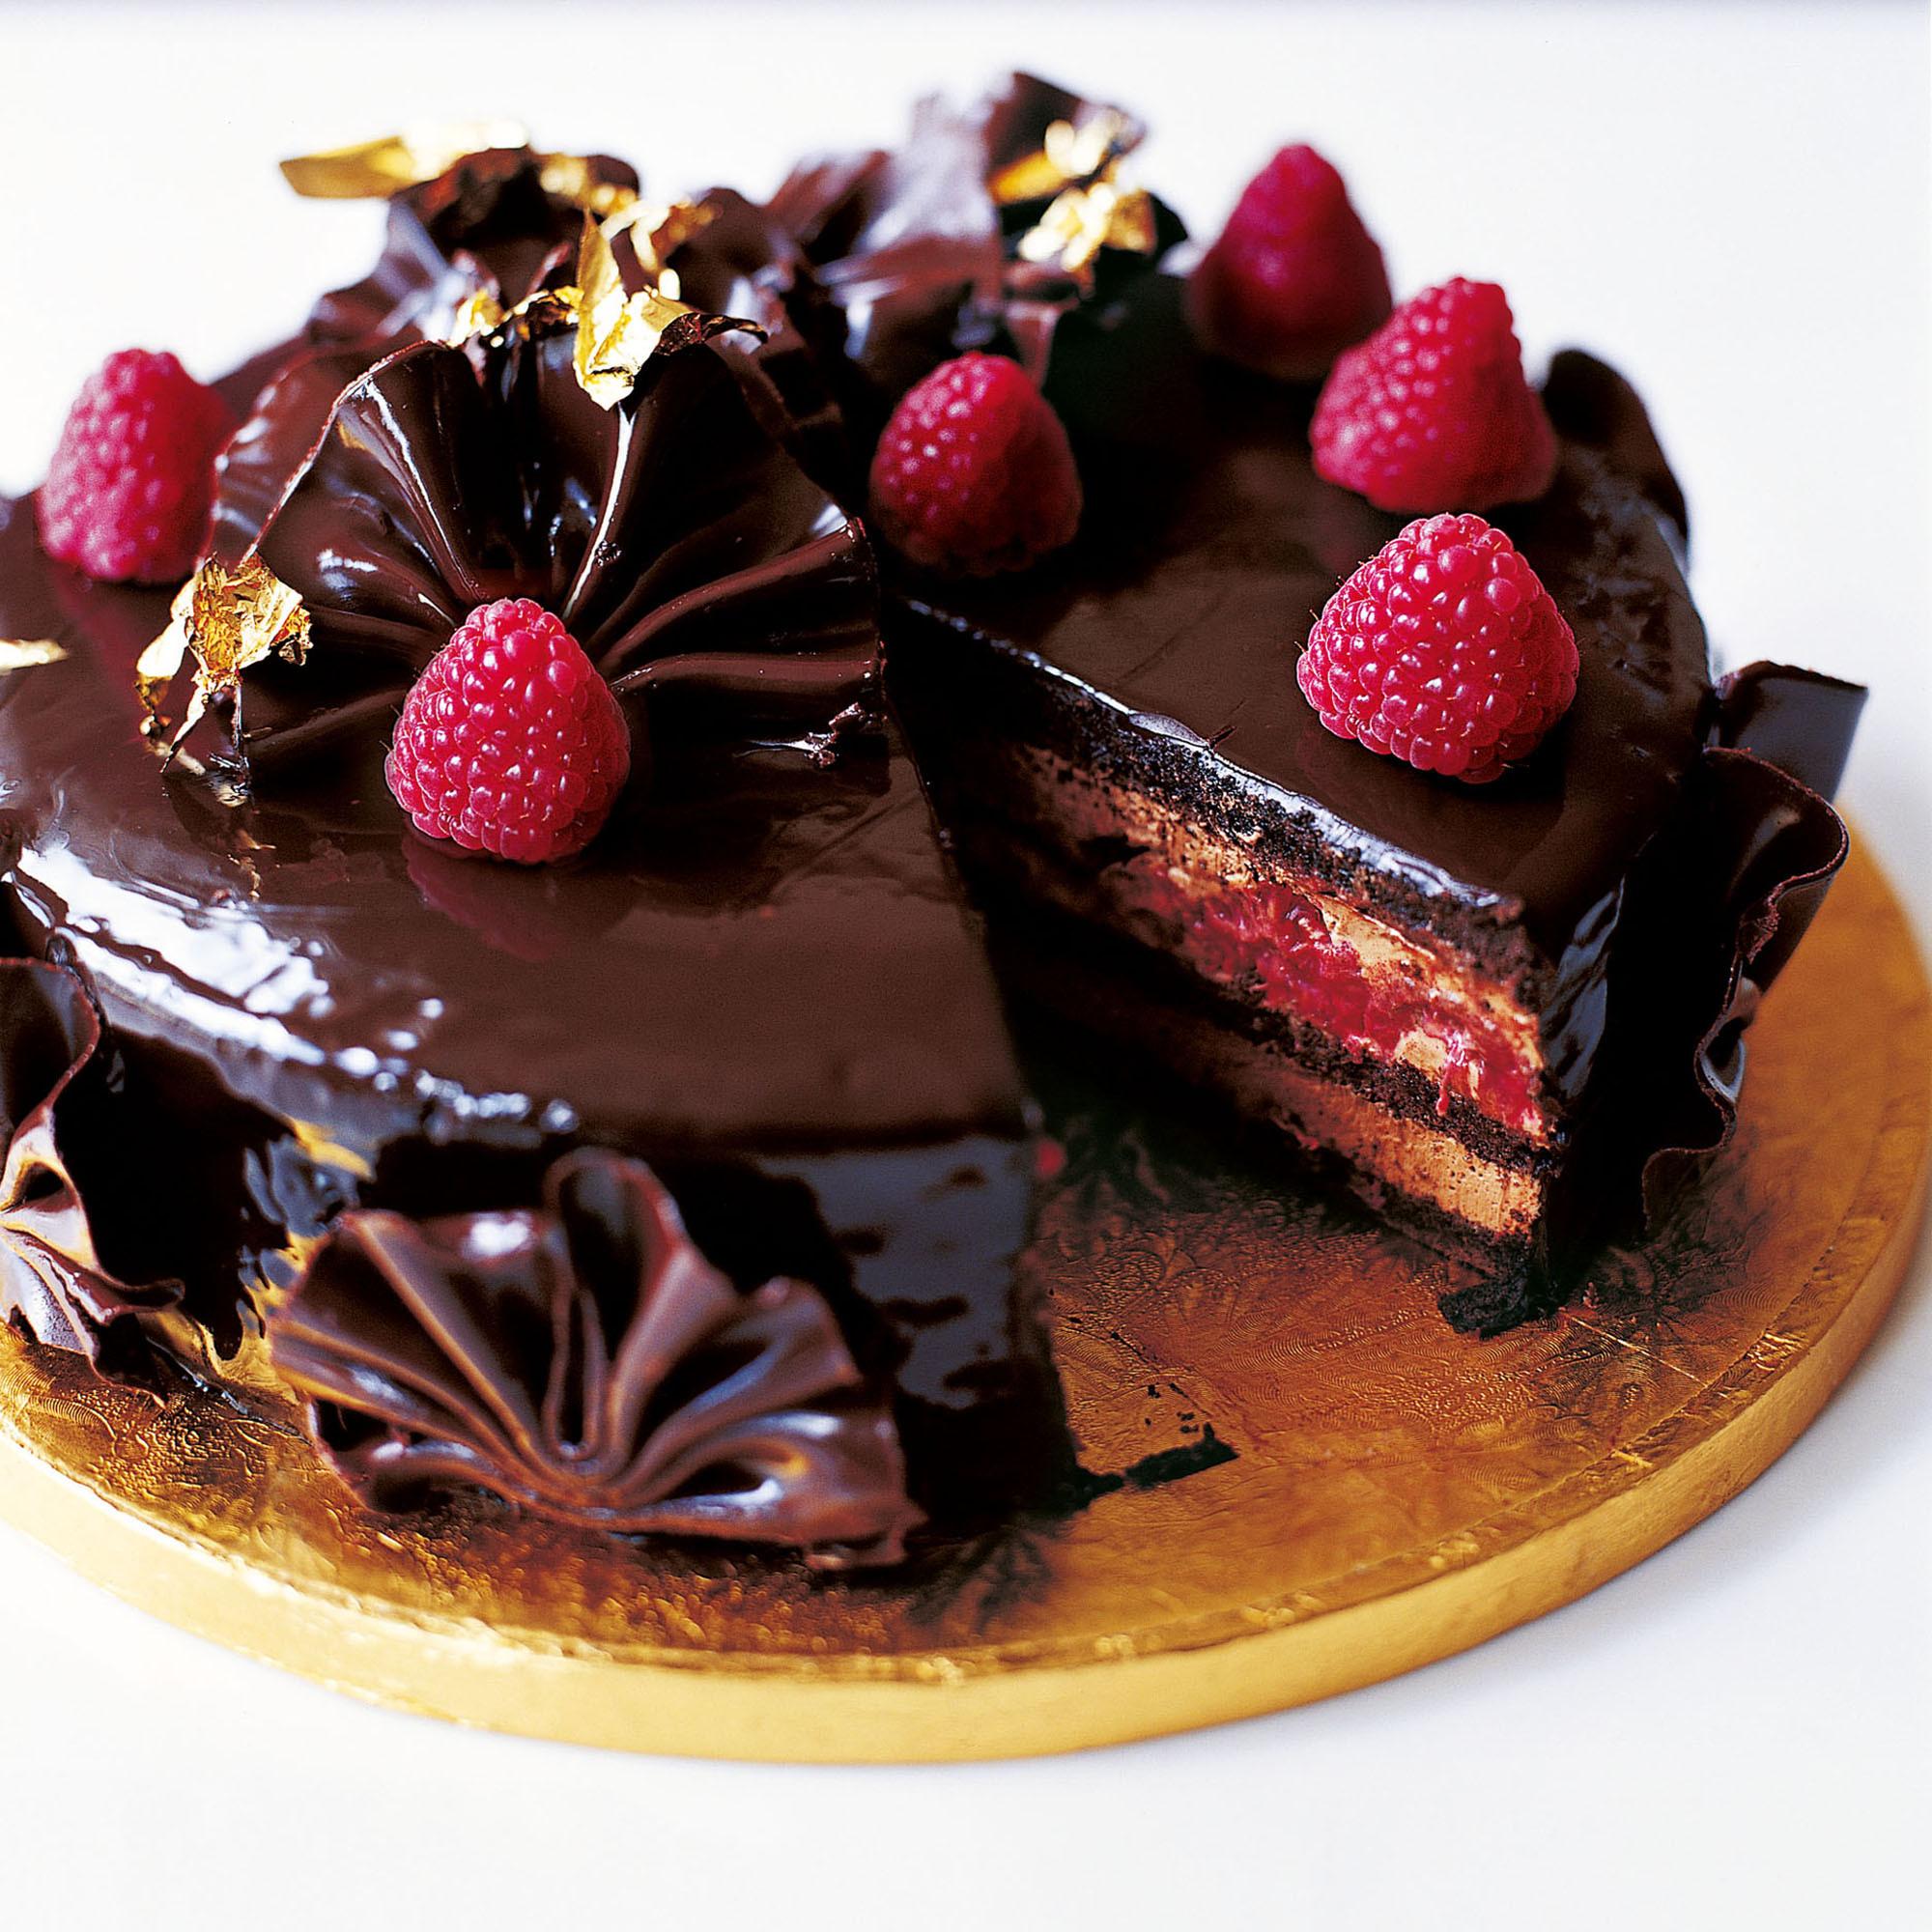 Chocolate Cake Ingredients  Eric Lanlard s Glamorous Chocolate Cake Woman And Home